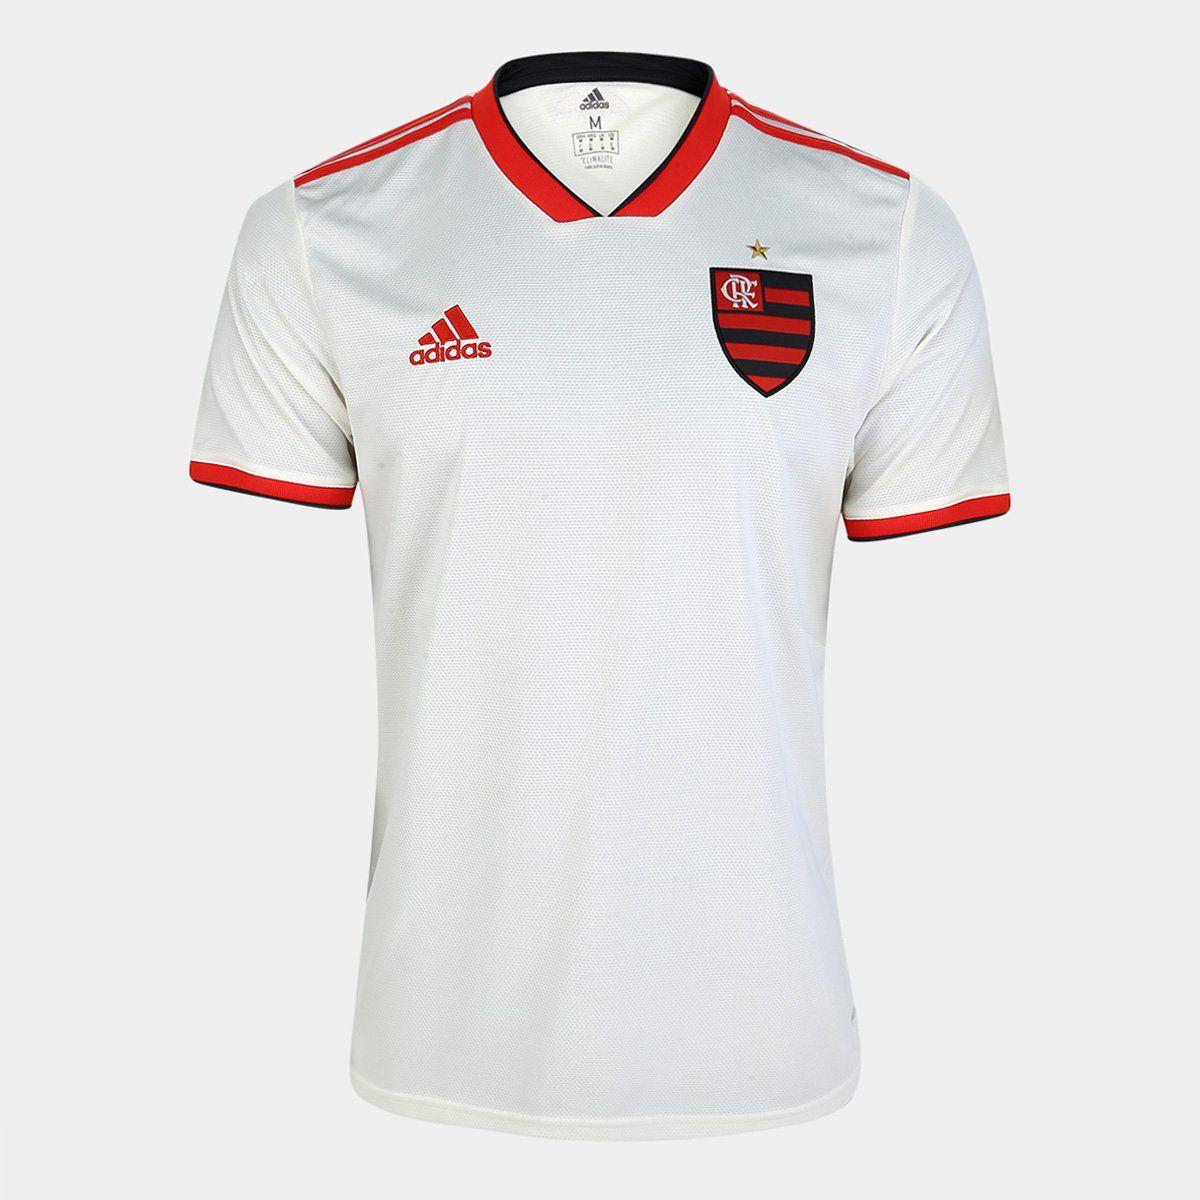 Flamengo II 2018 s/n° Torcedor Adidas Masculina - Camisa Branca